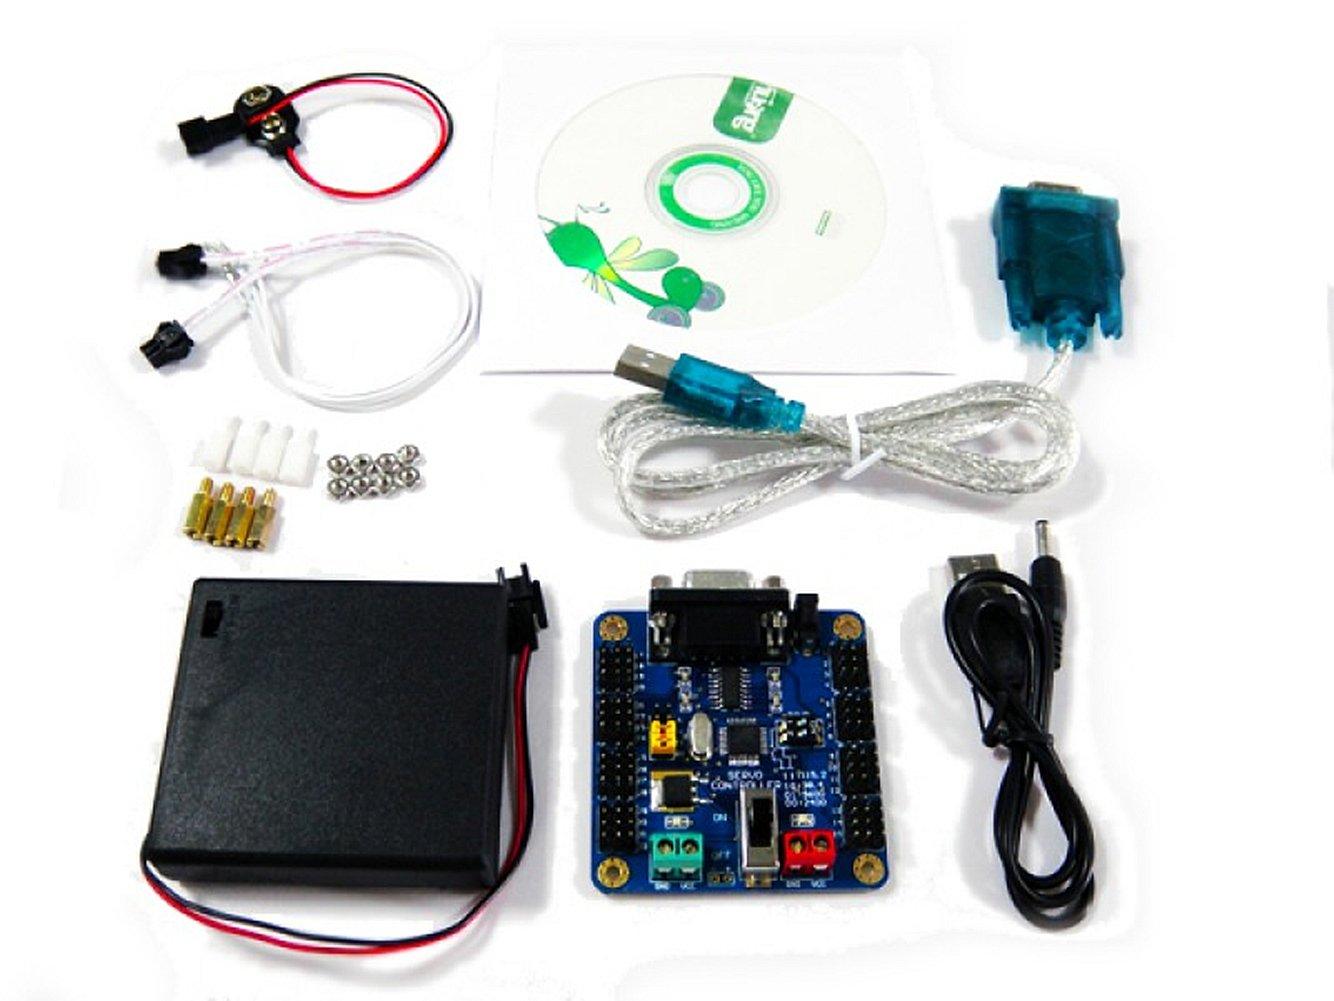 32 Channels Servo Controller Kit for Robotic Arm Biped Robot Kit